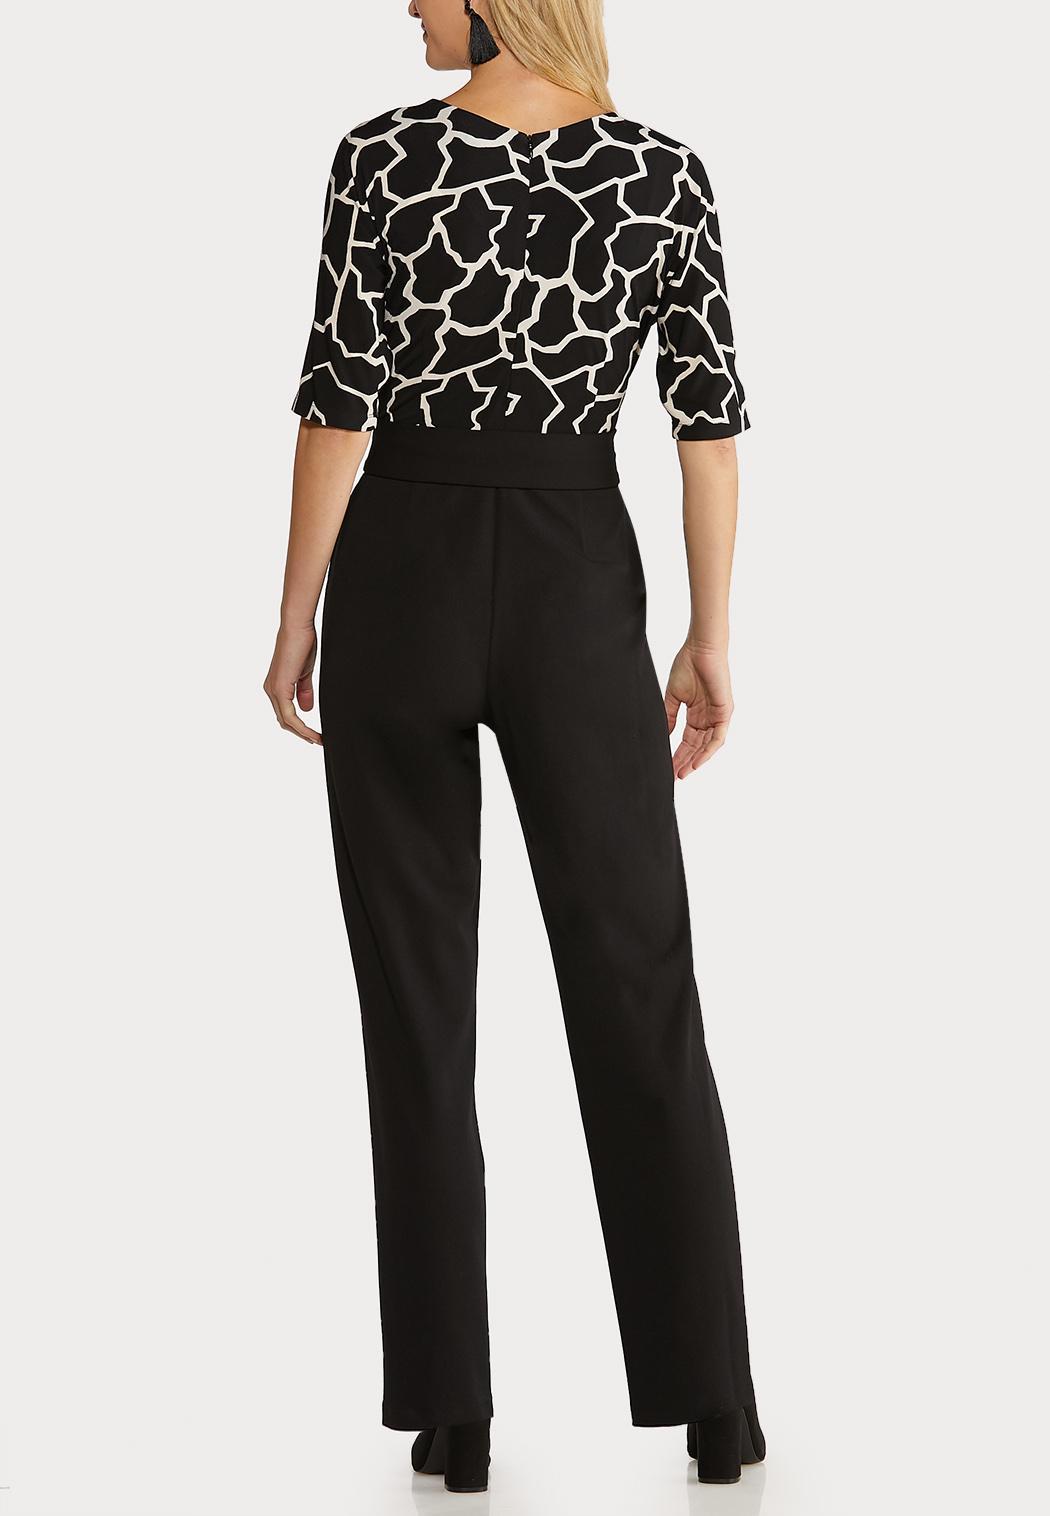 Black White Belted Jumpsuit (Item #44070383)